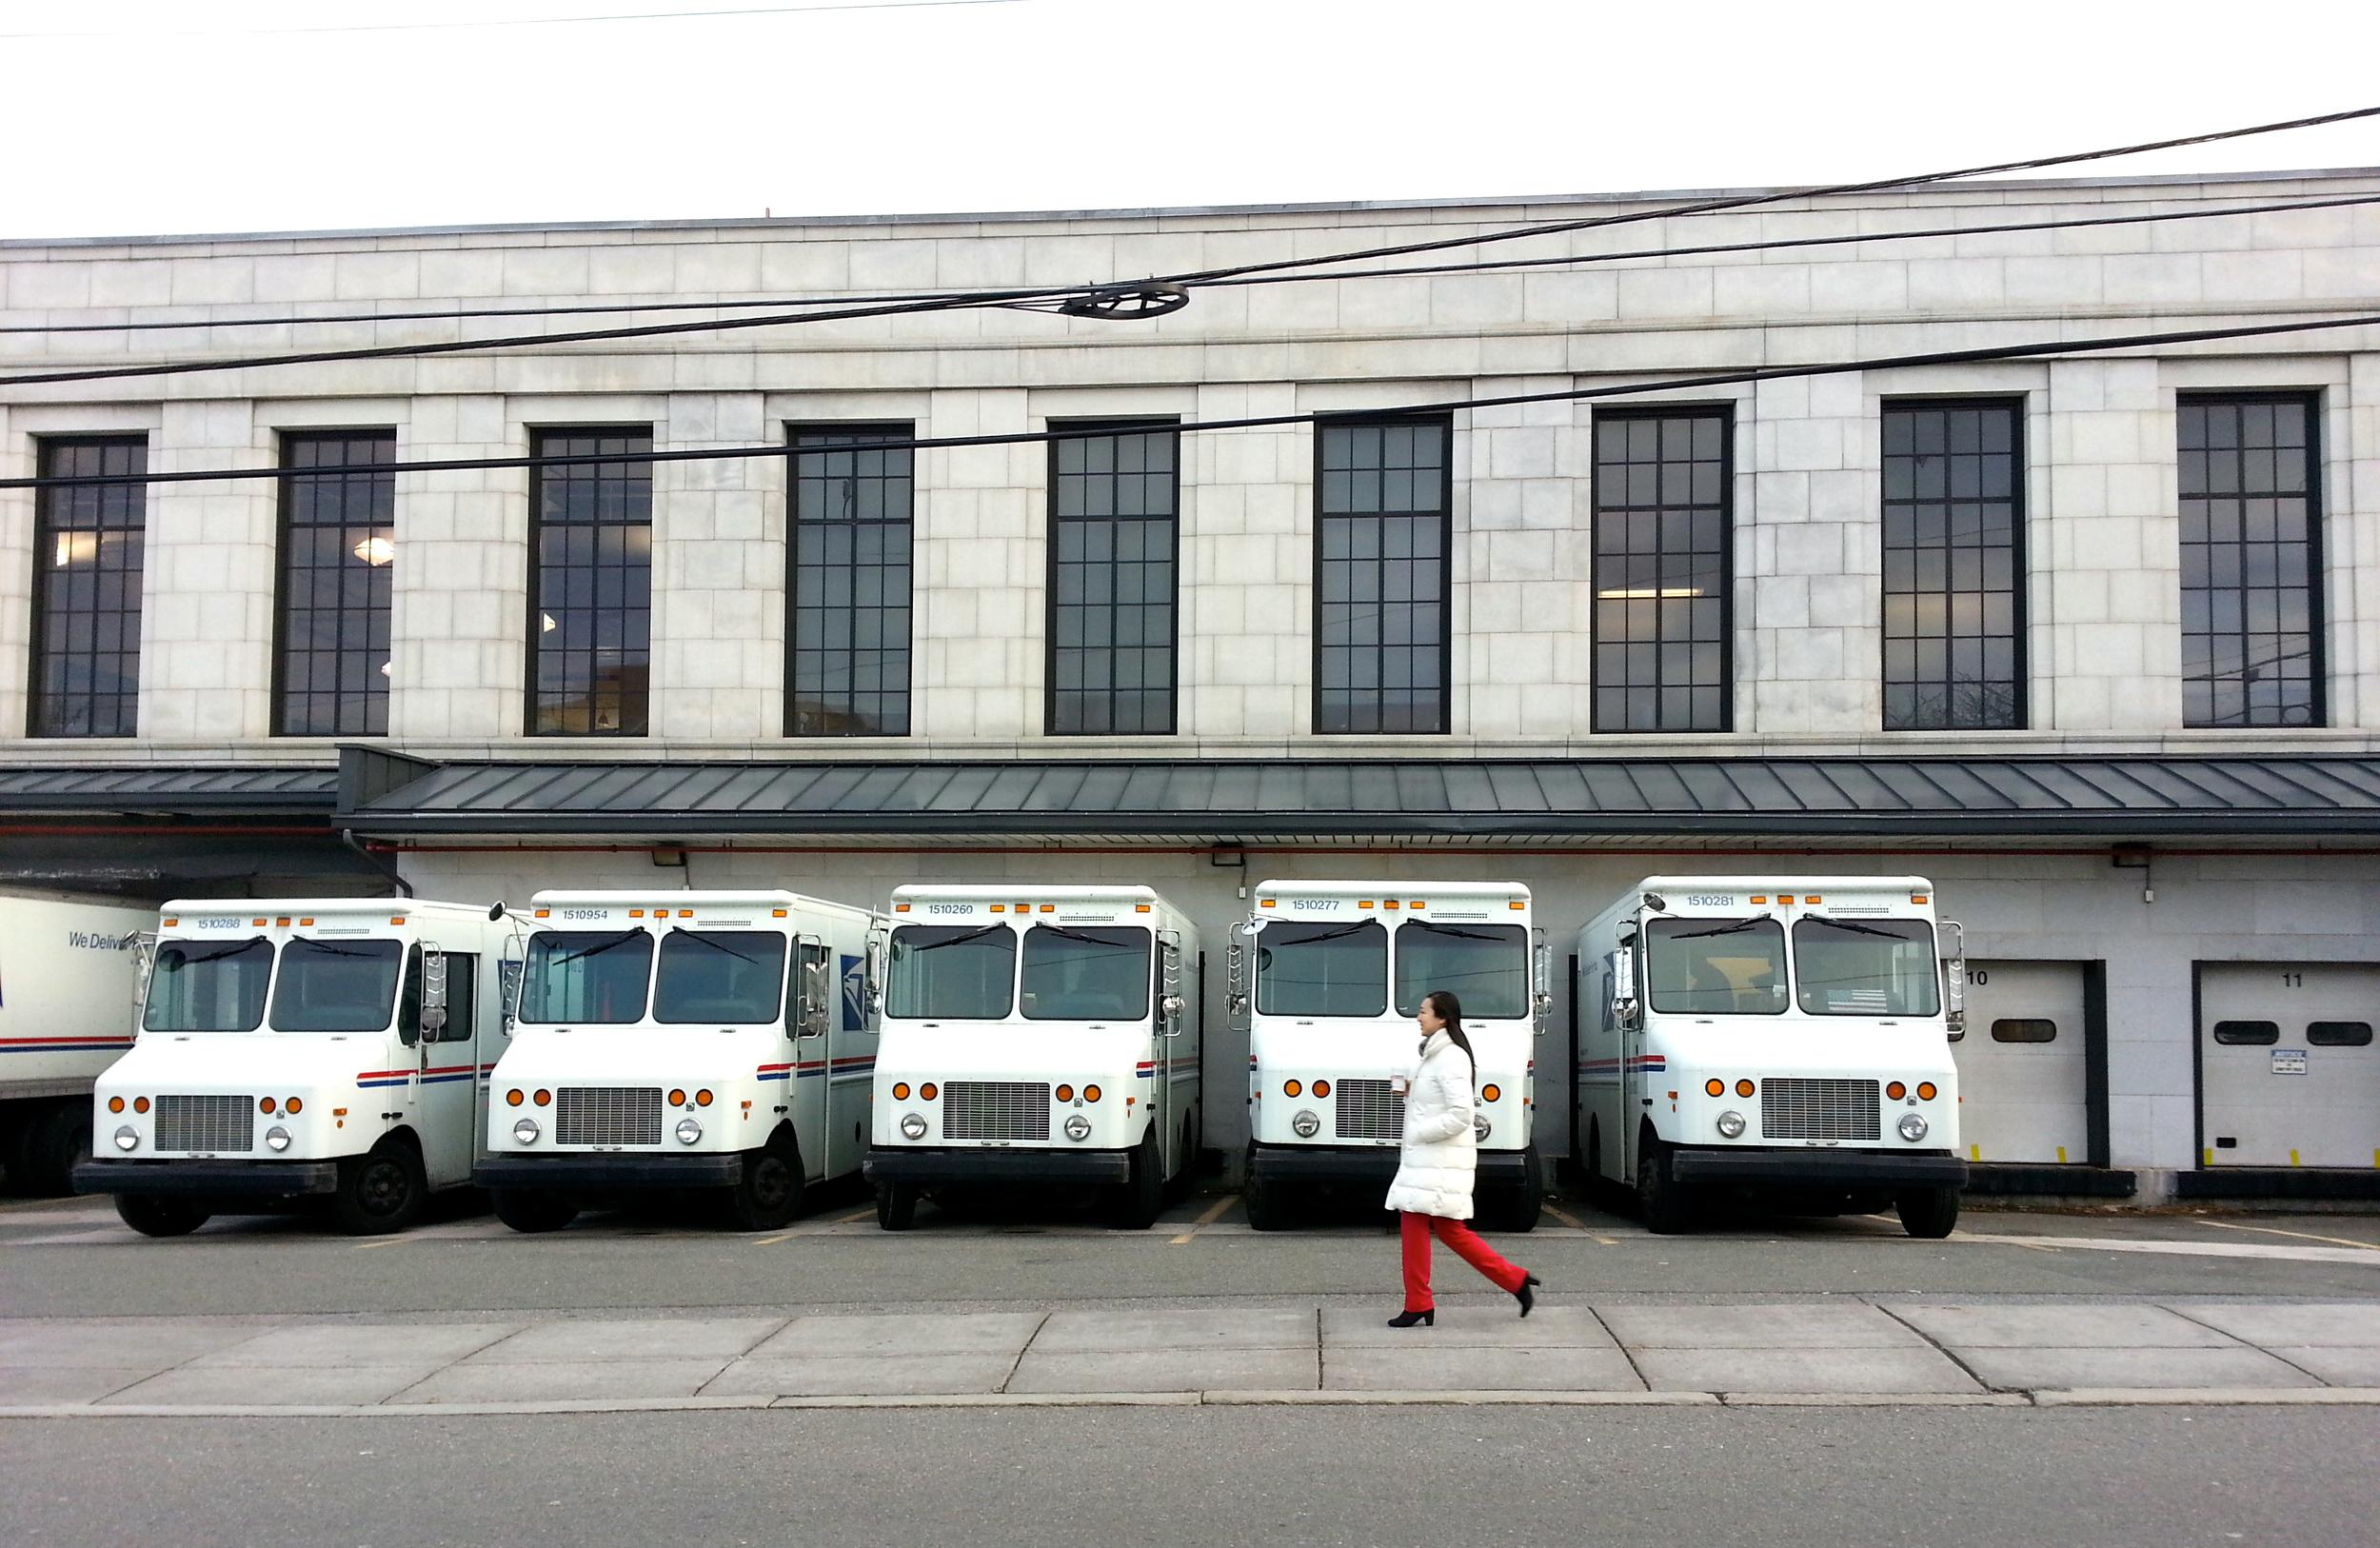 post office, cambridge (sonya kovacic)